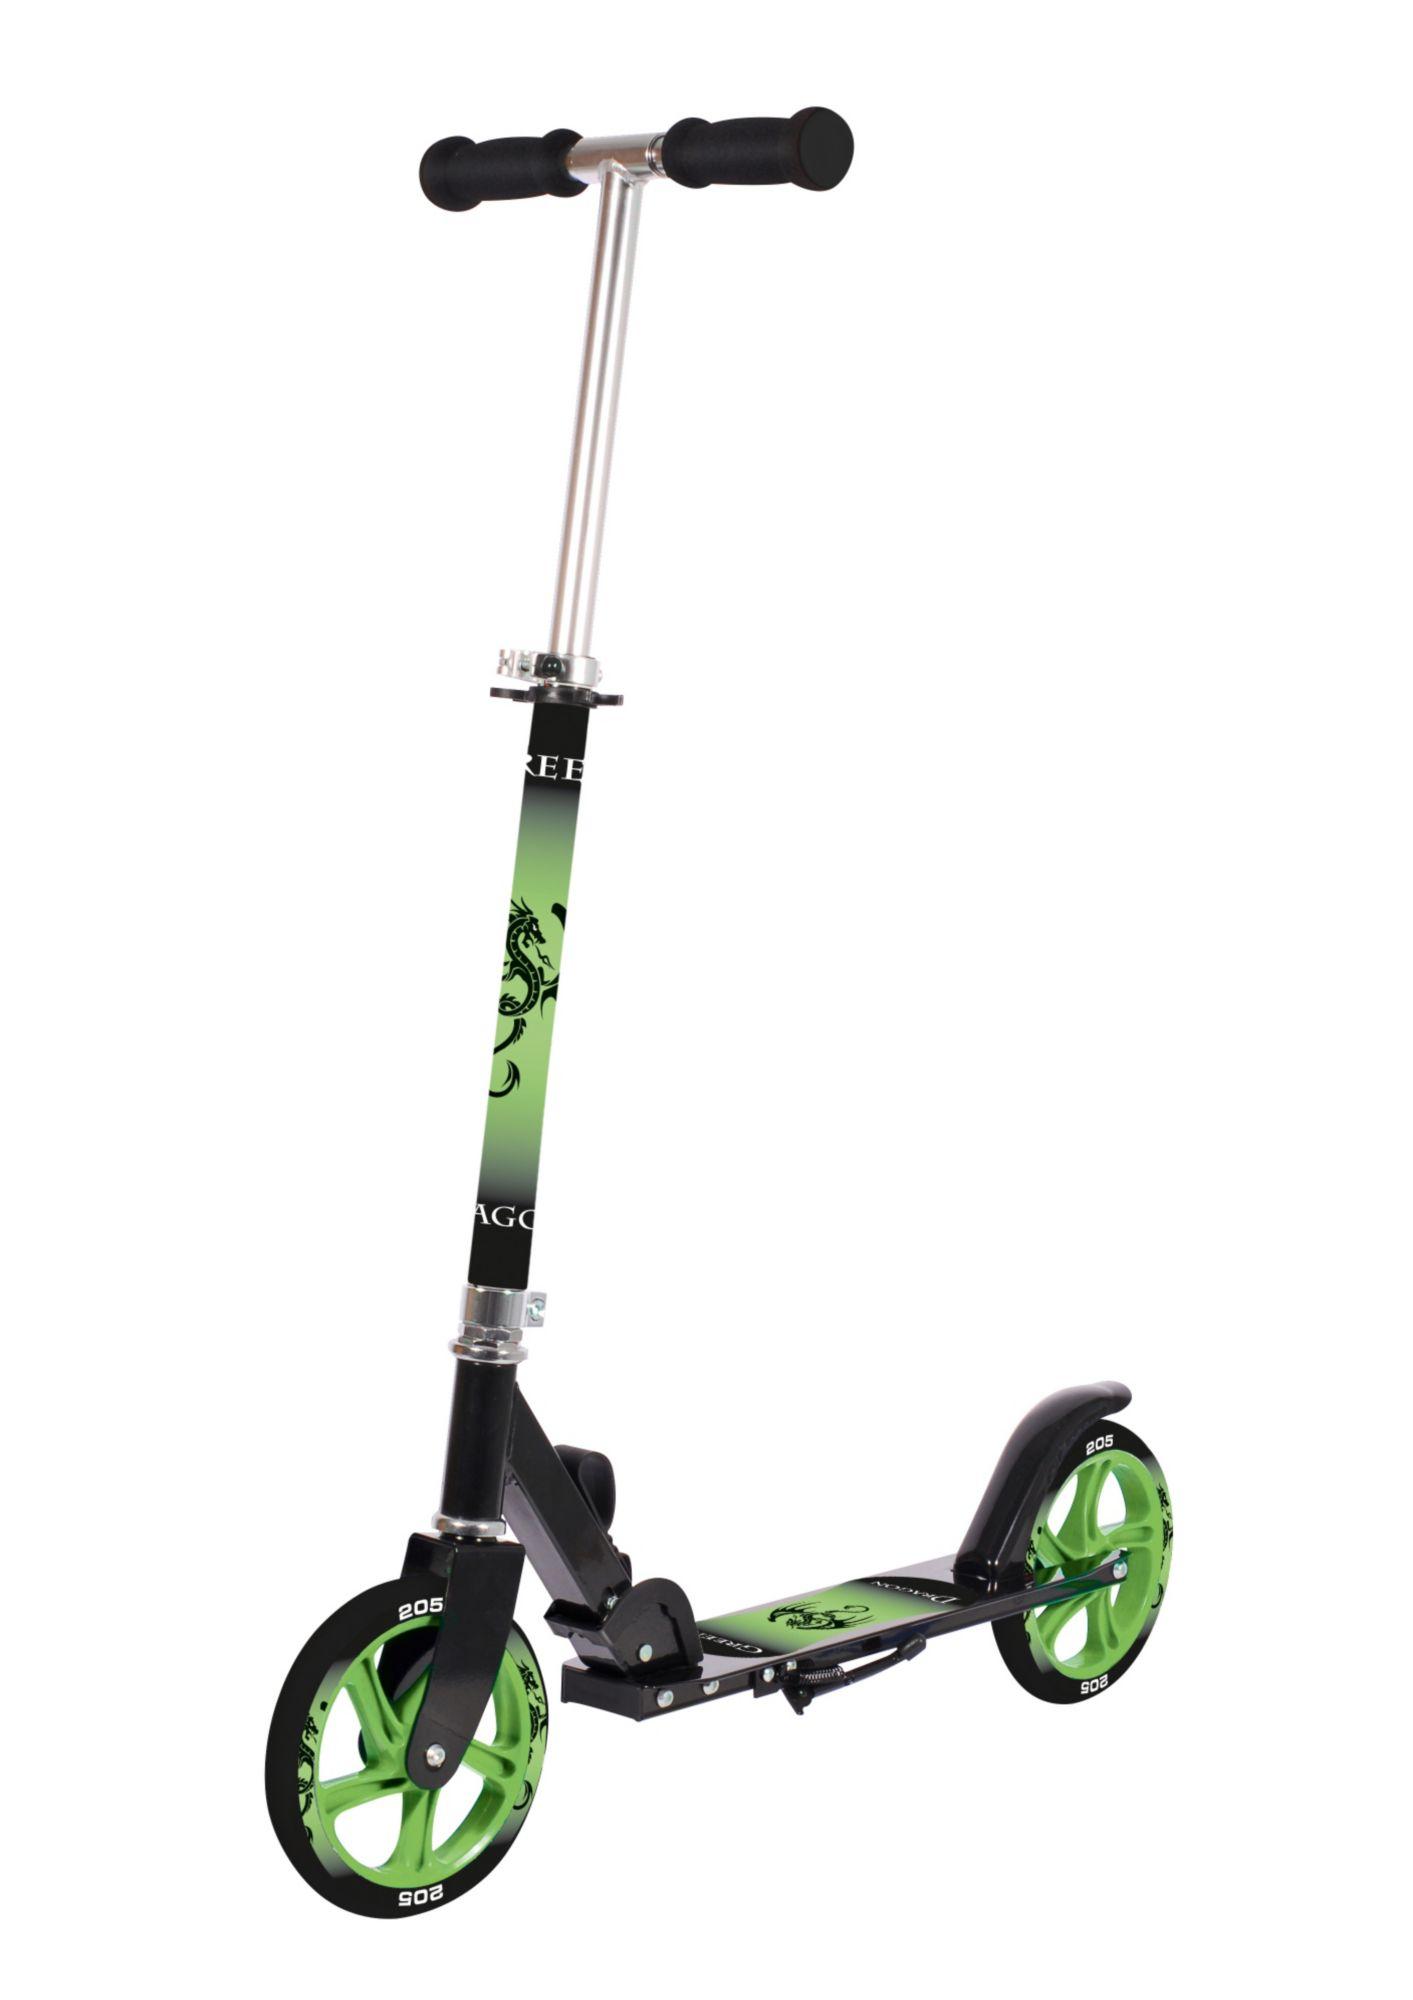 HUDORA Alu-Cityroller, schwarz-grün, »Green Dragon«, Hudora